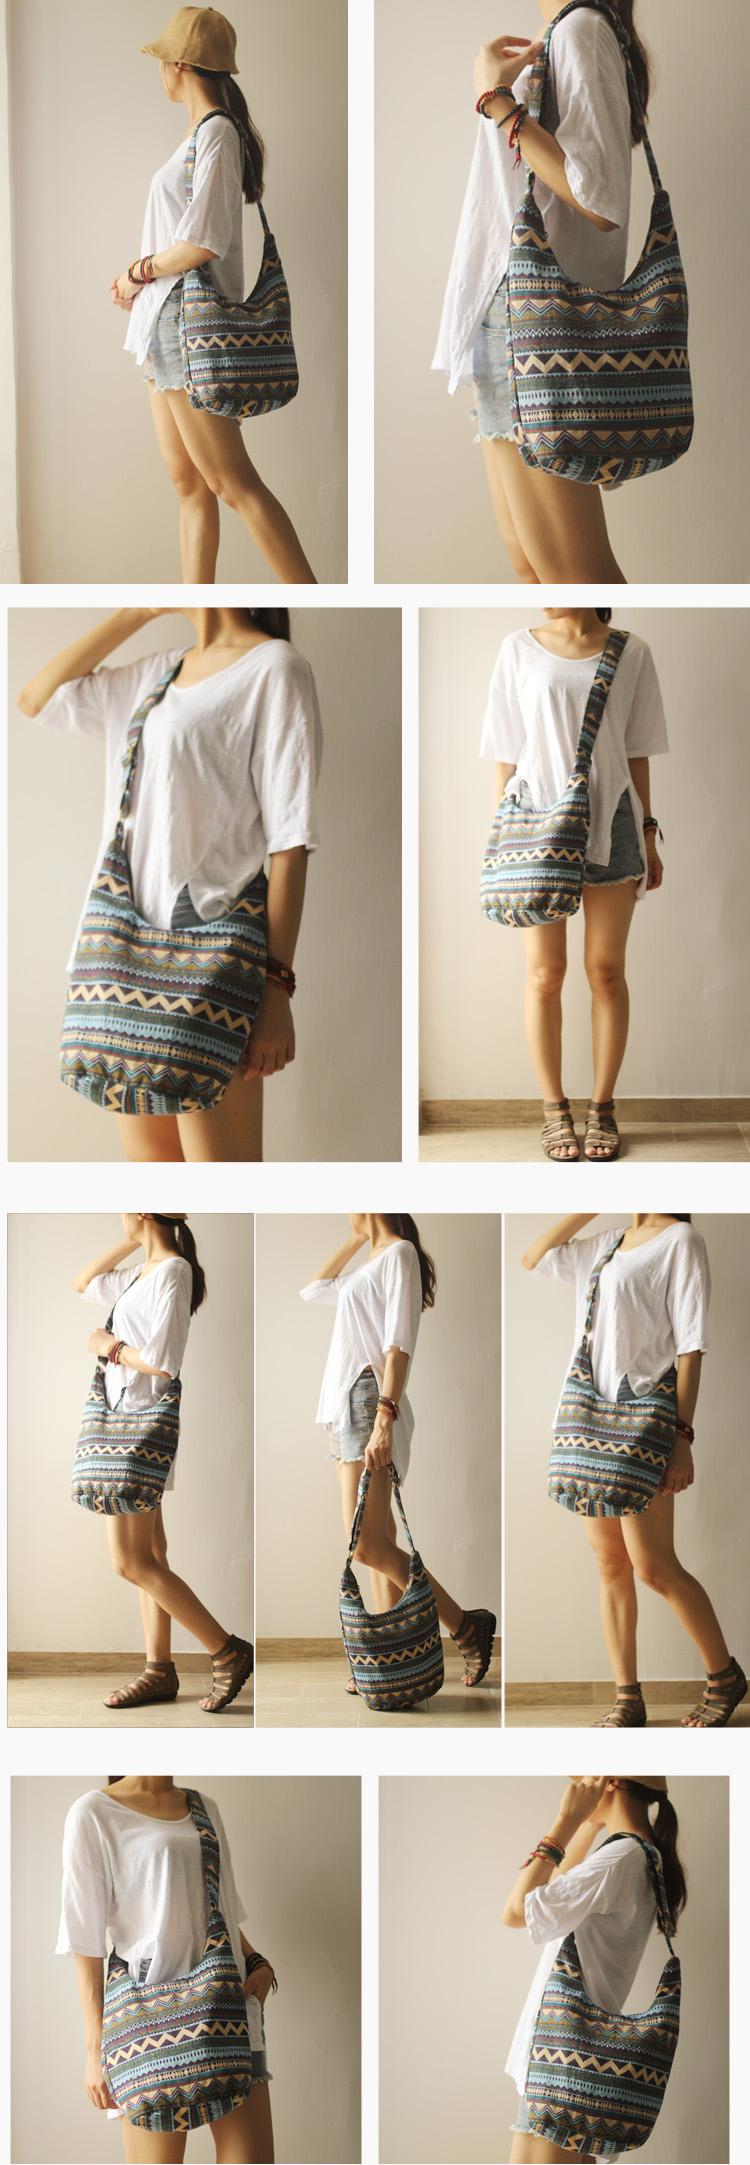 Women Vintage Shoulder Bag Plain Travel Overnight Hobo Sling Crossbody Hipster Bag  (6)